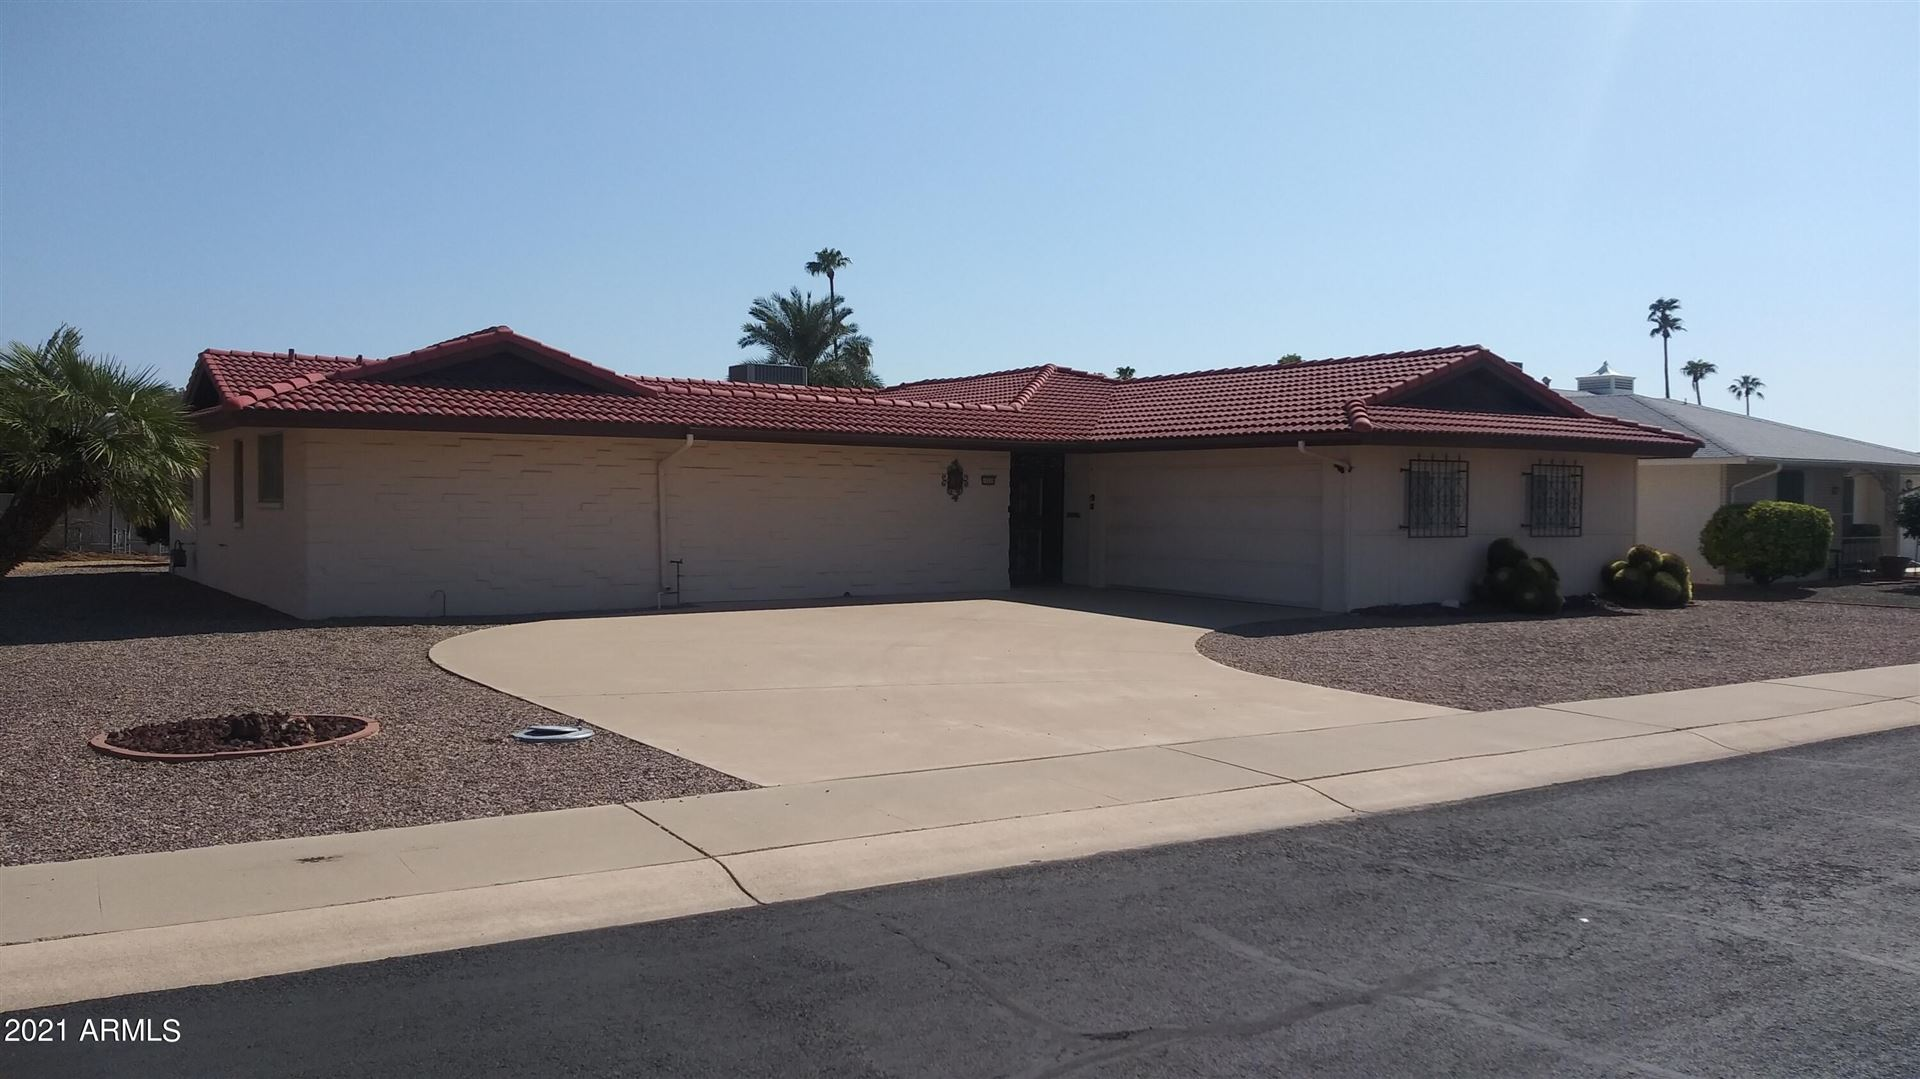 10209 W Cinnebar Avenue, Sun City, AZ 85351 - MLS#: 6285879